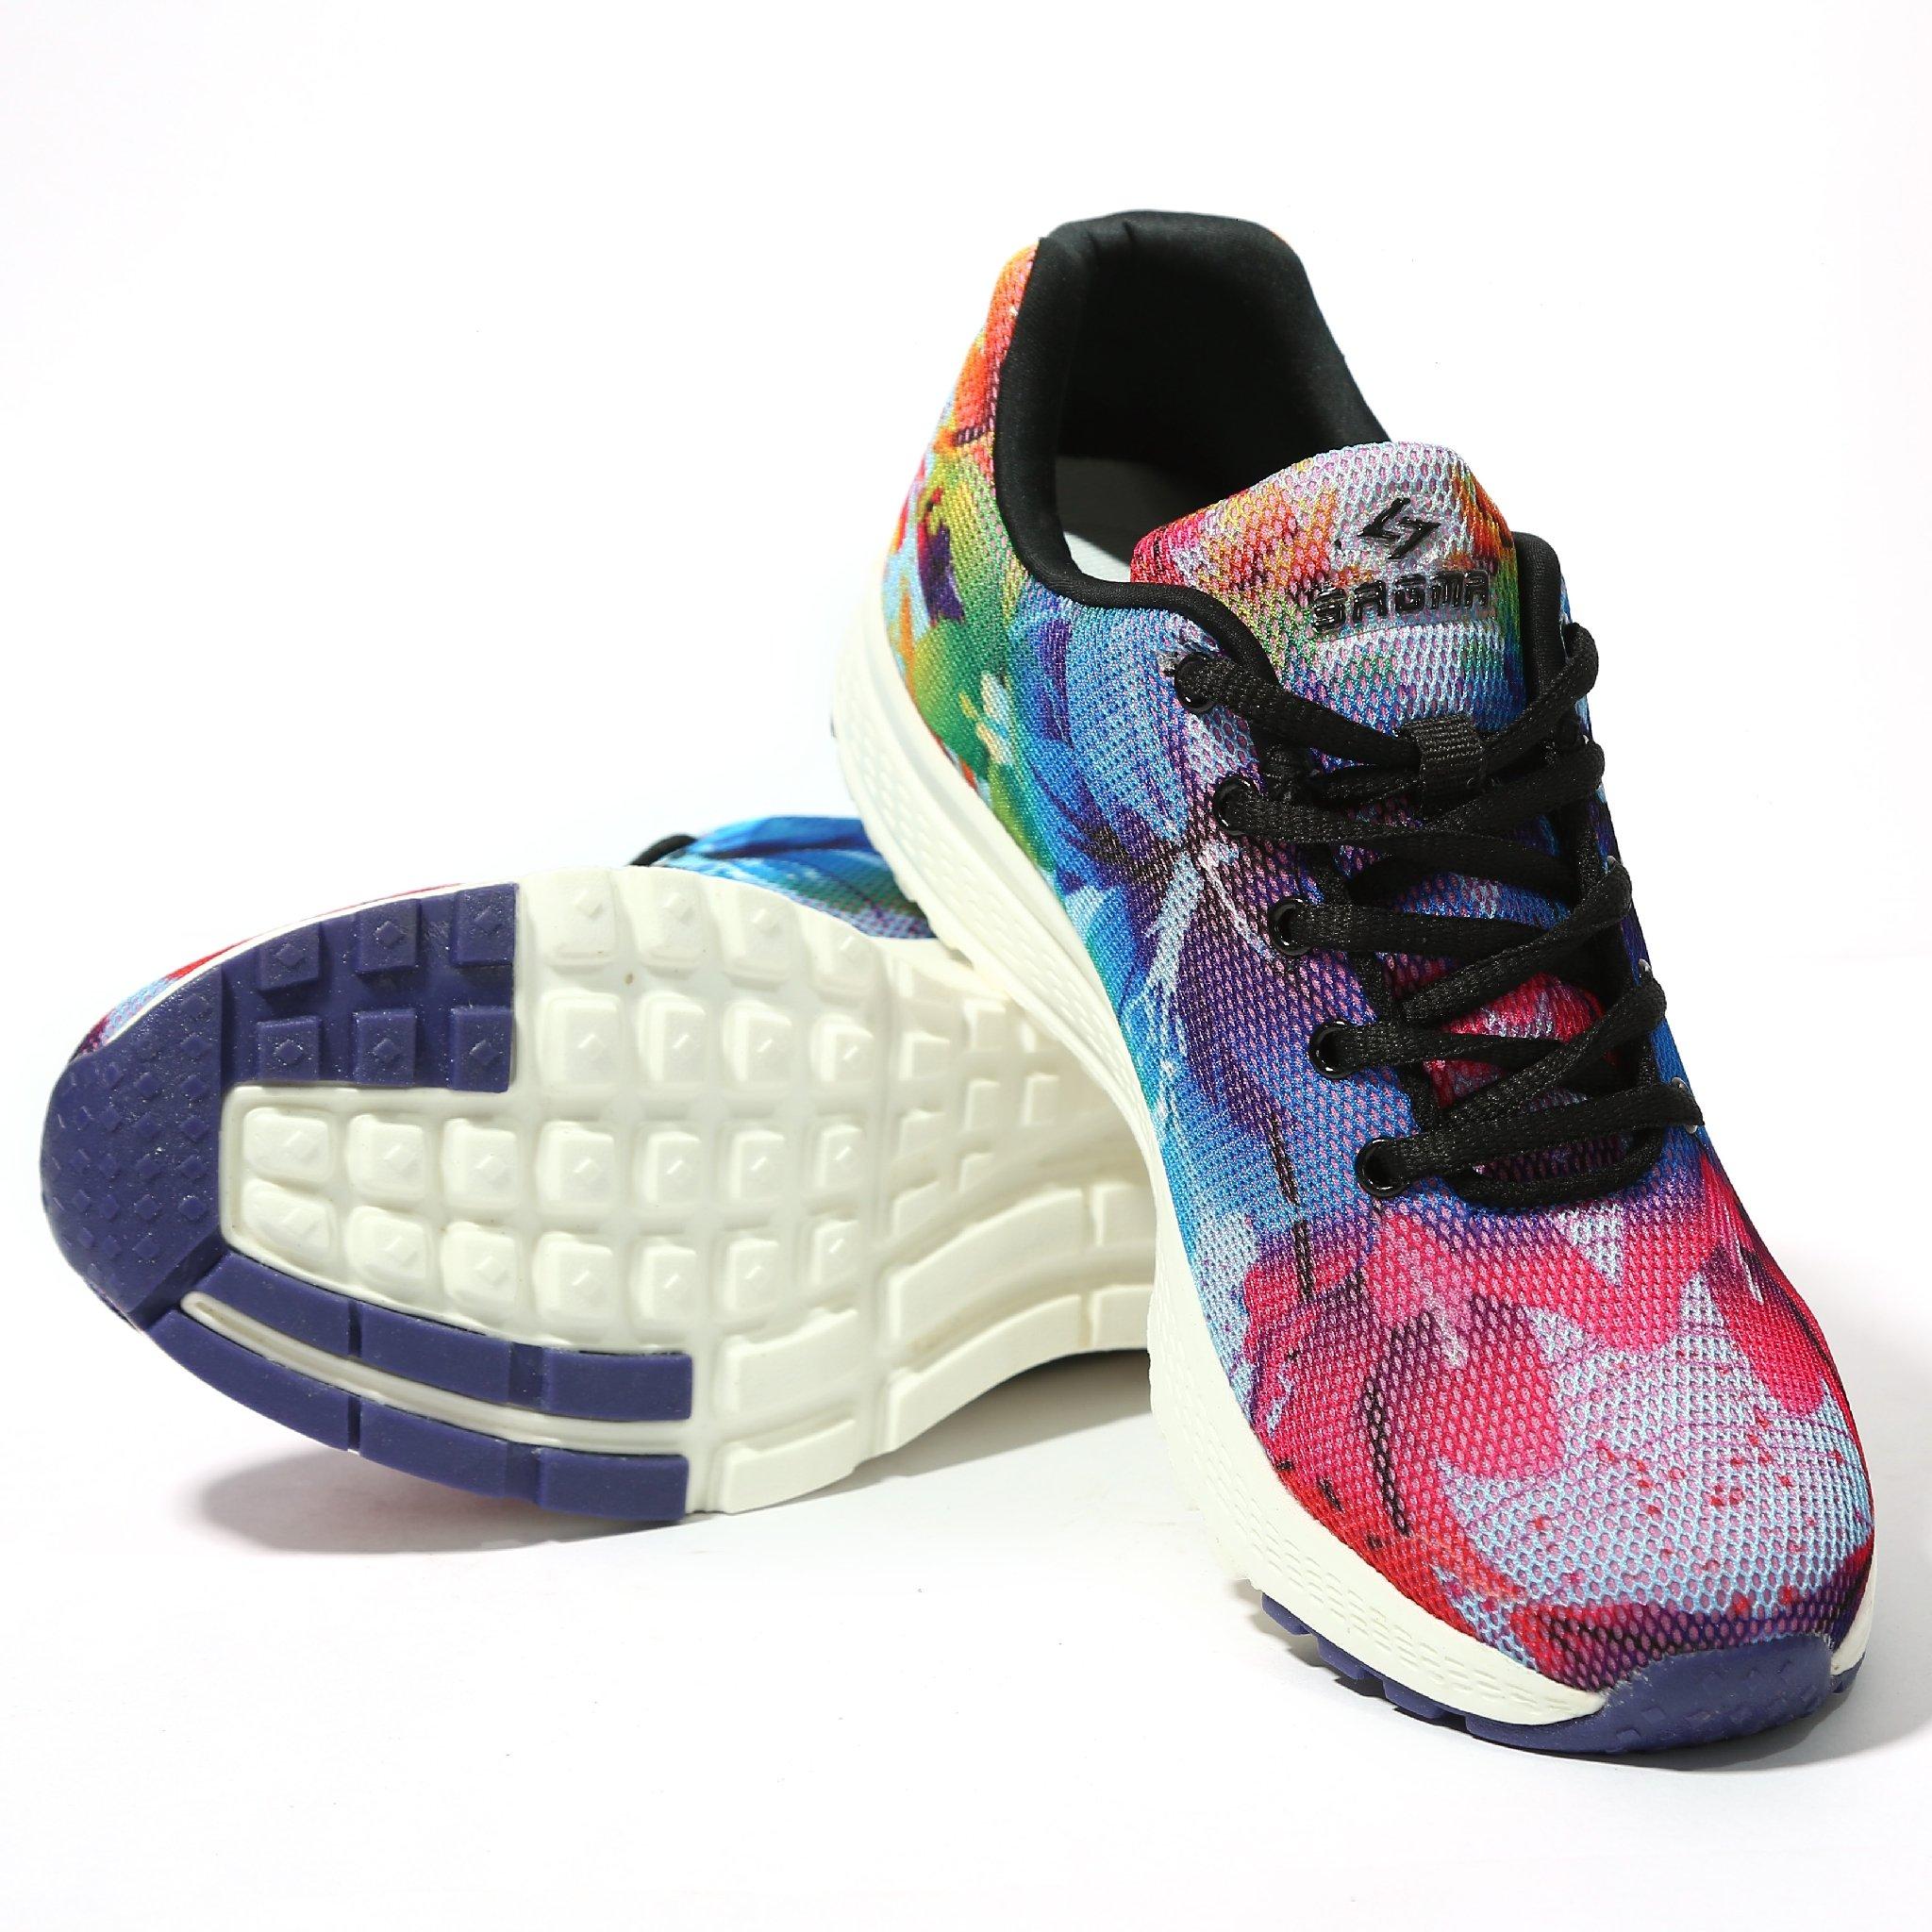 sagma sports shoes price